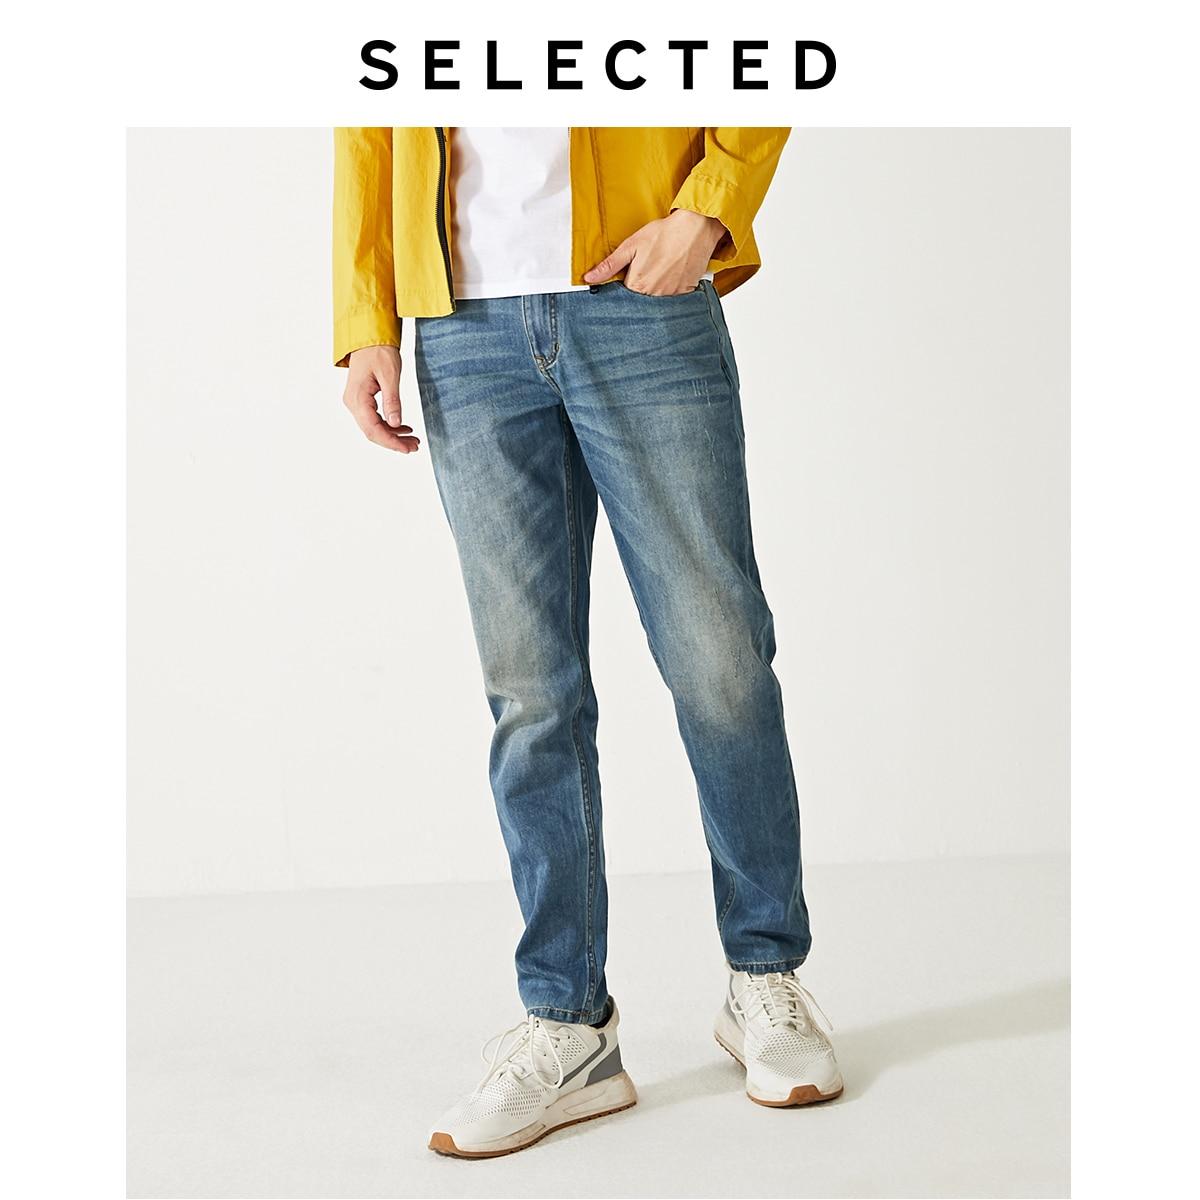 SELECTED Men's Slight Stretch Denim Pants New Regular Casual Tapered Tight-leg Jeans S 419332526